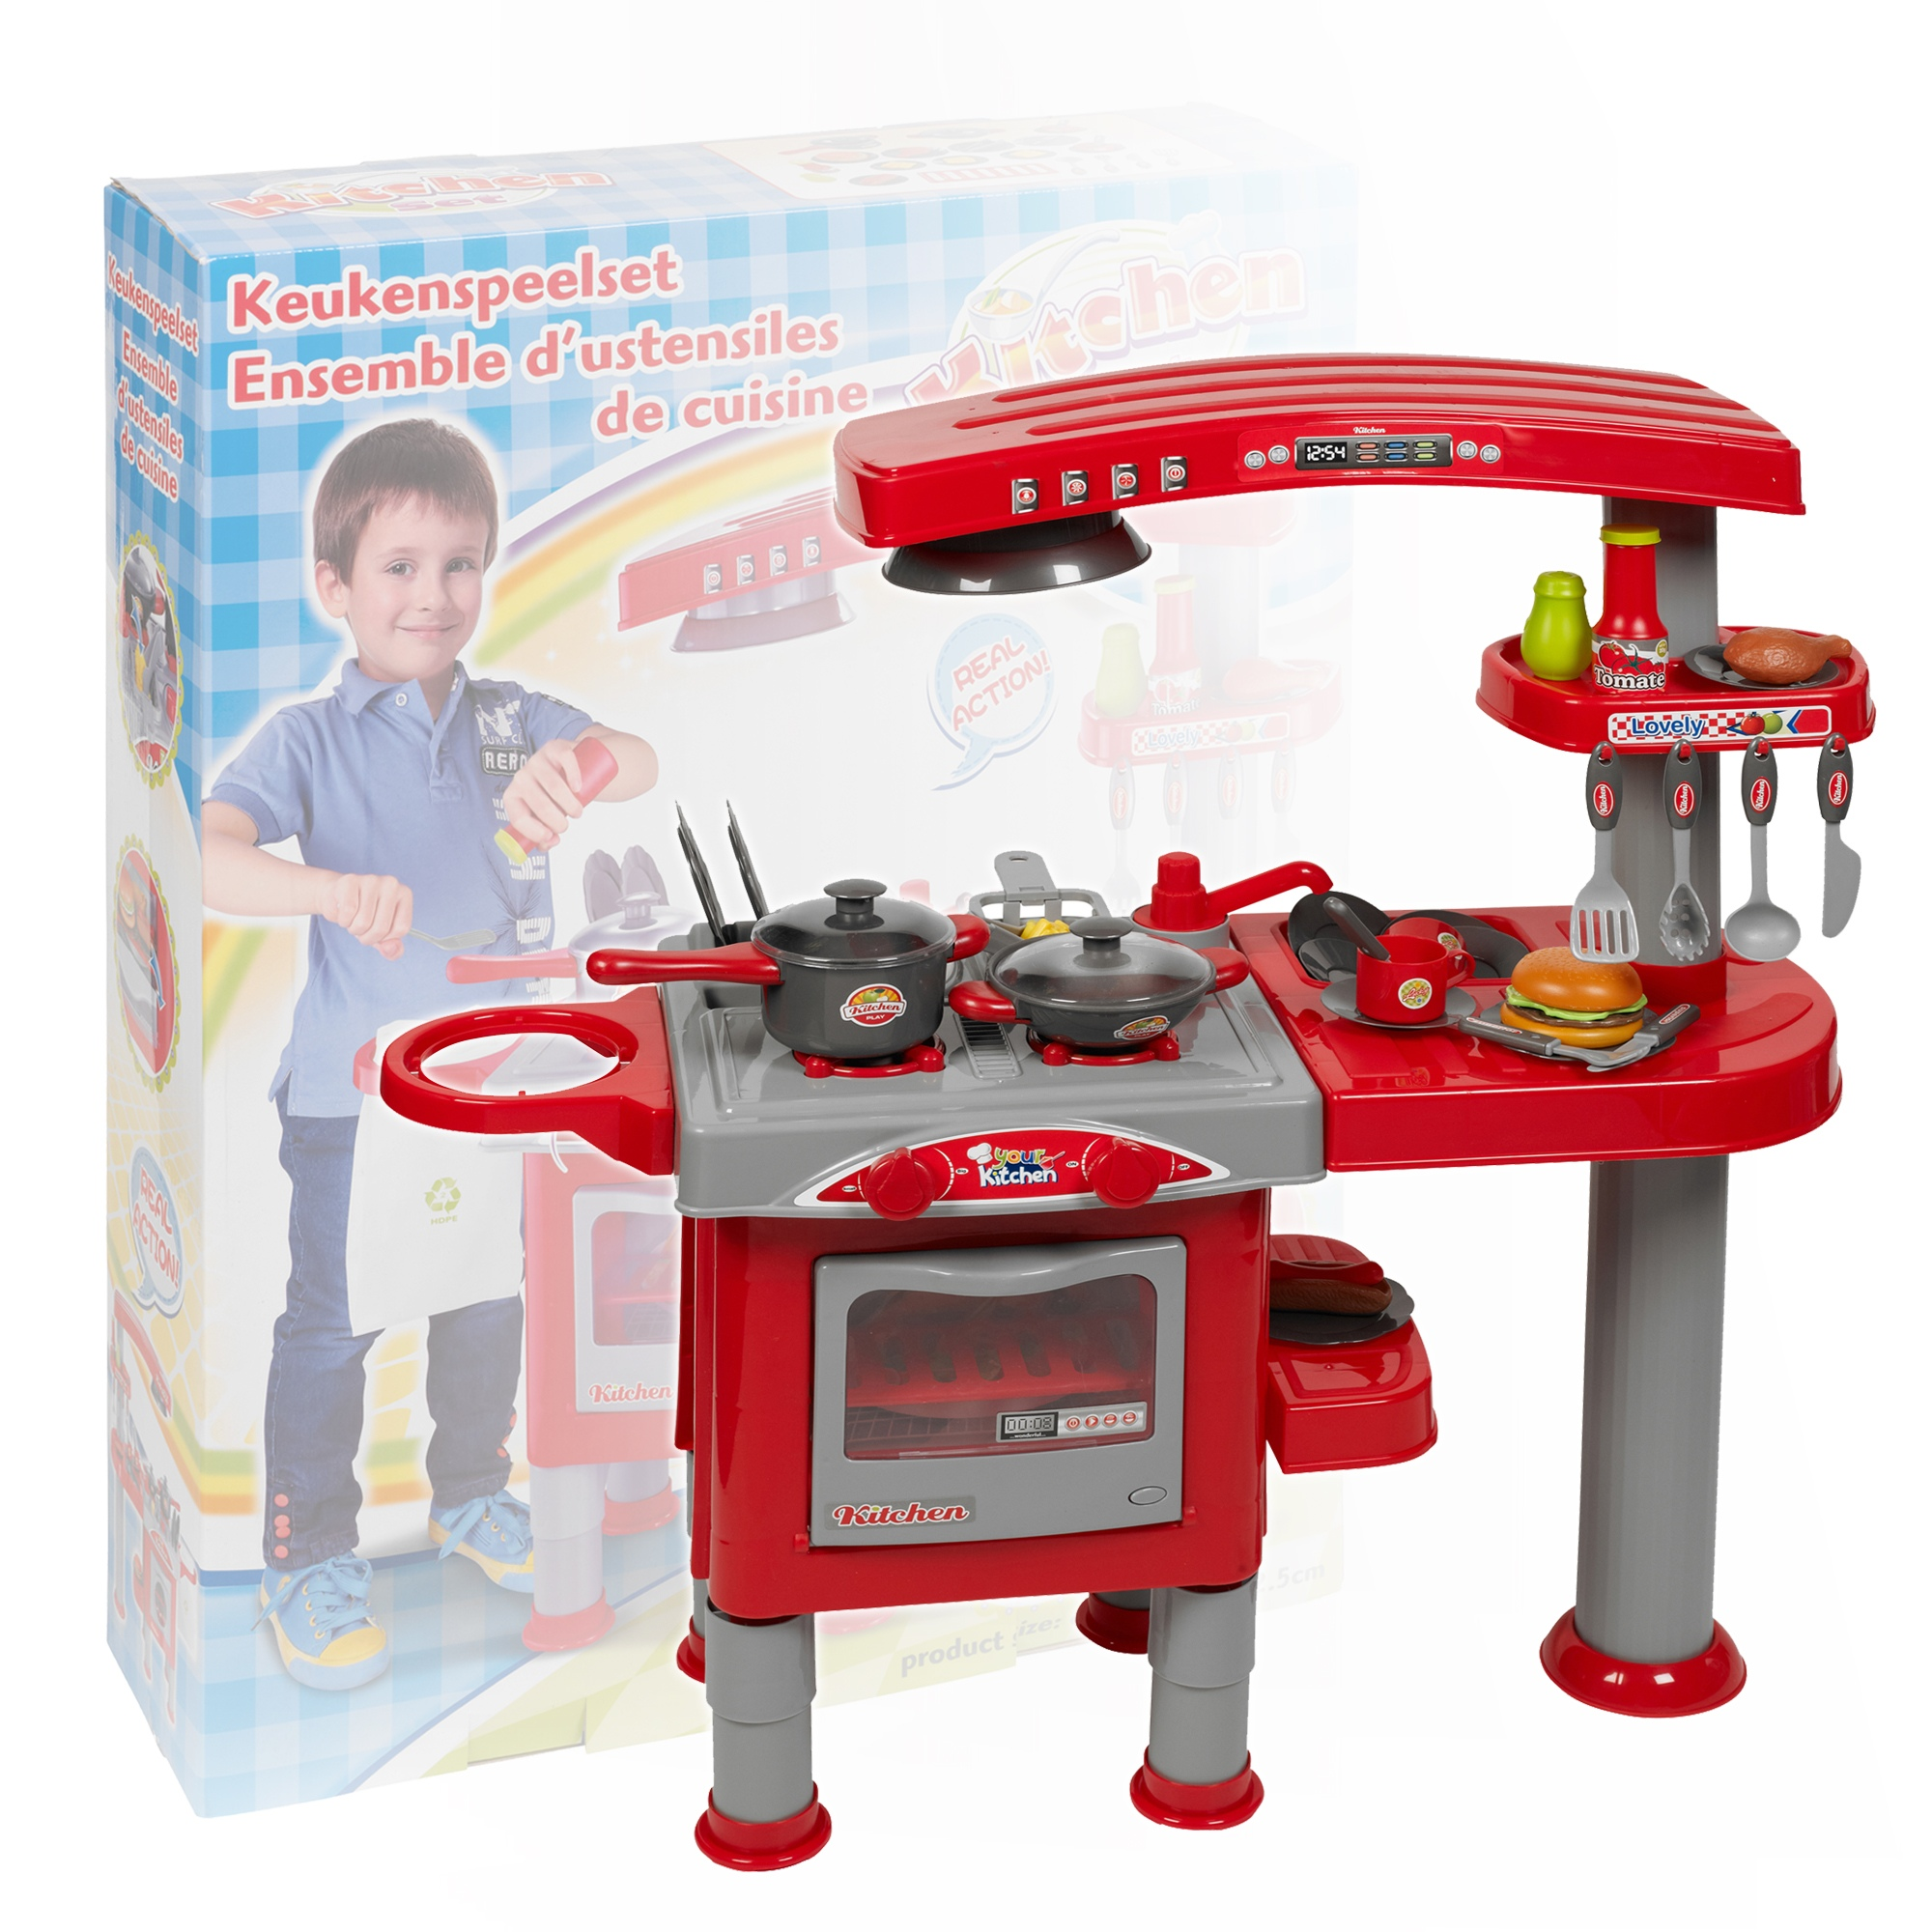 69 Piece Kitchen Cooking Children S Play Set Toy Boys Girls Role